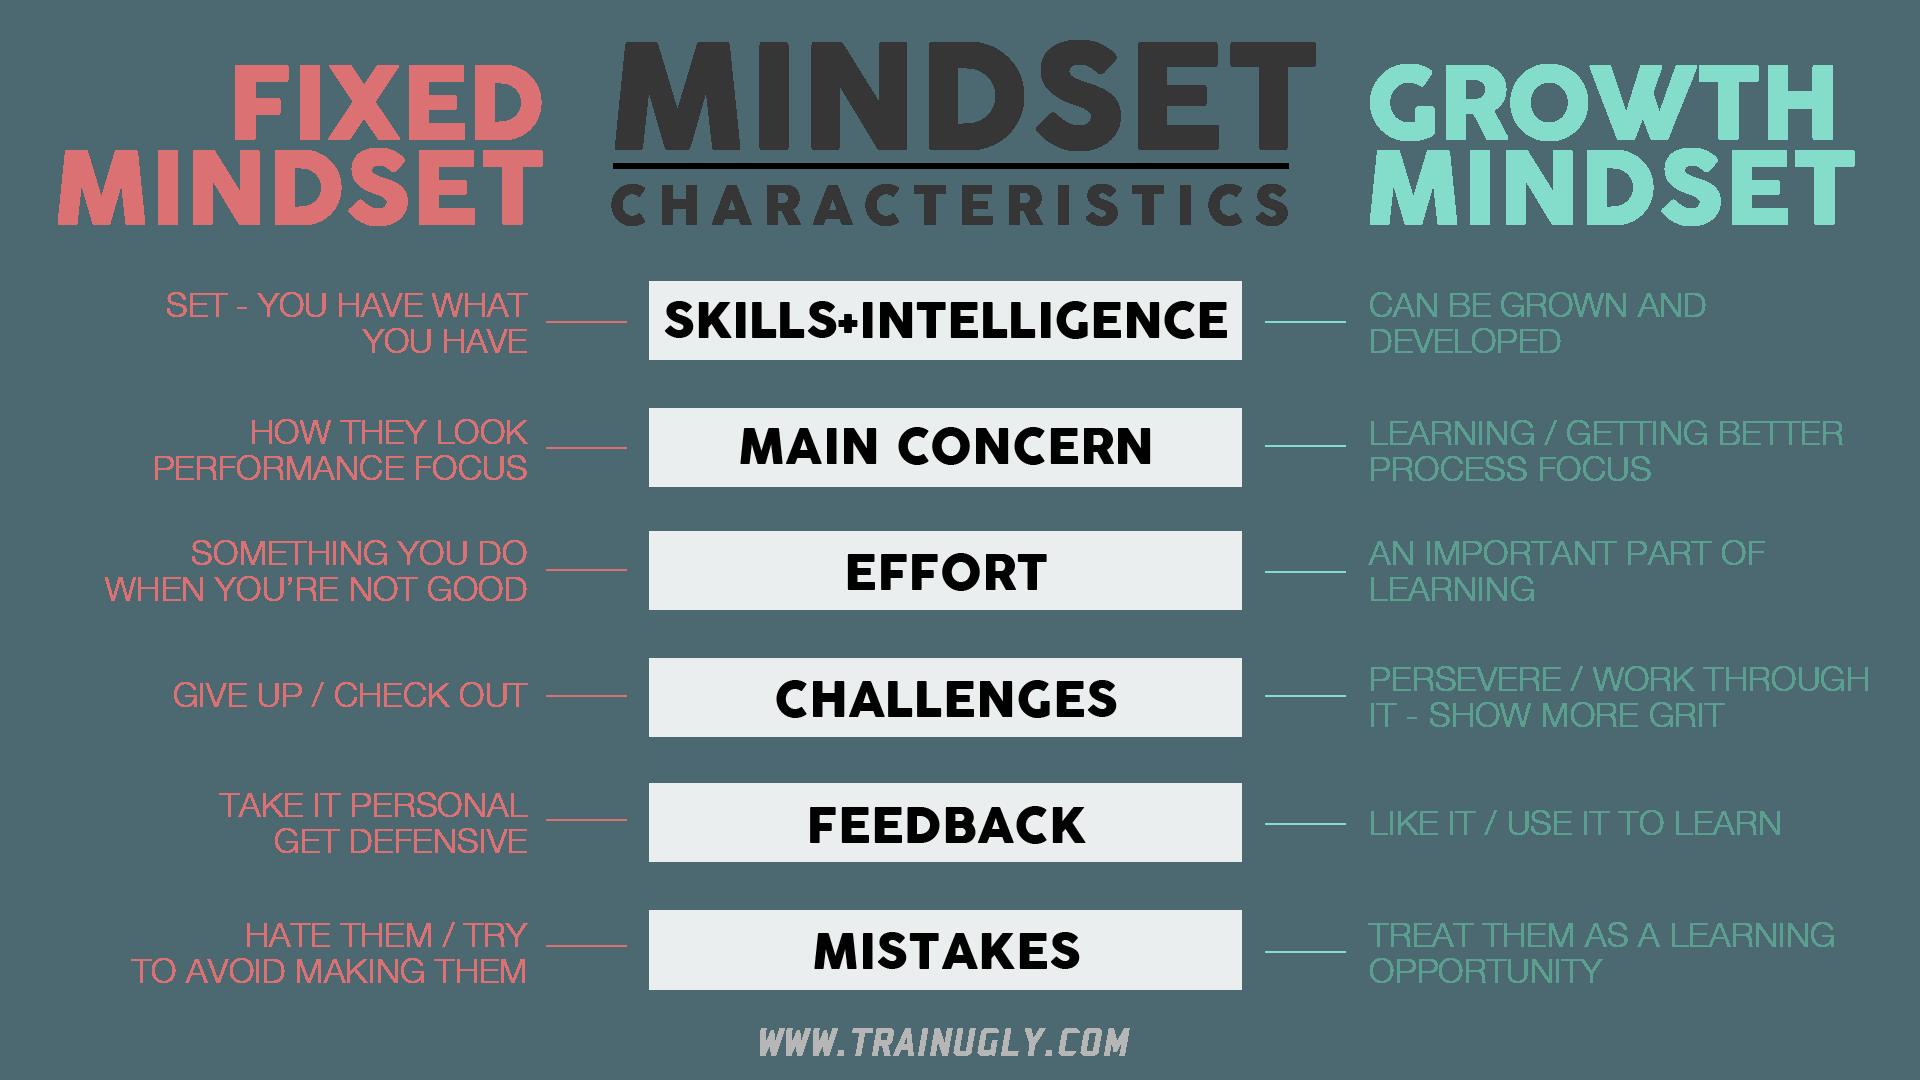 Growth Mindset Characteristics Table